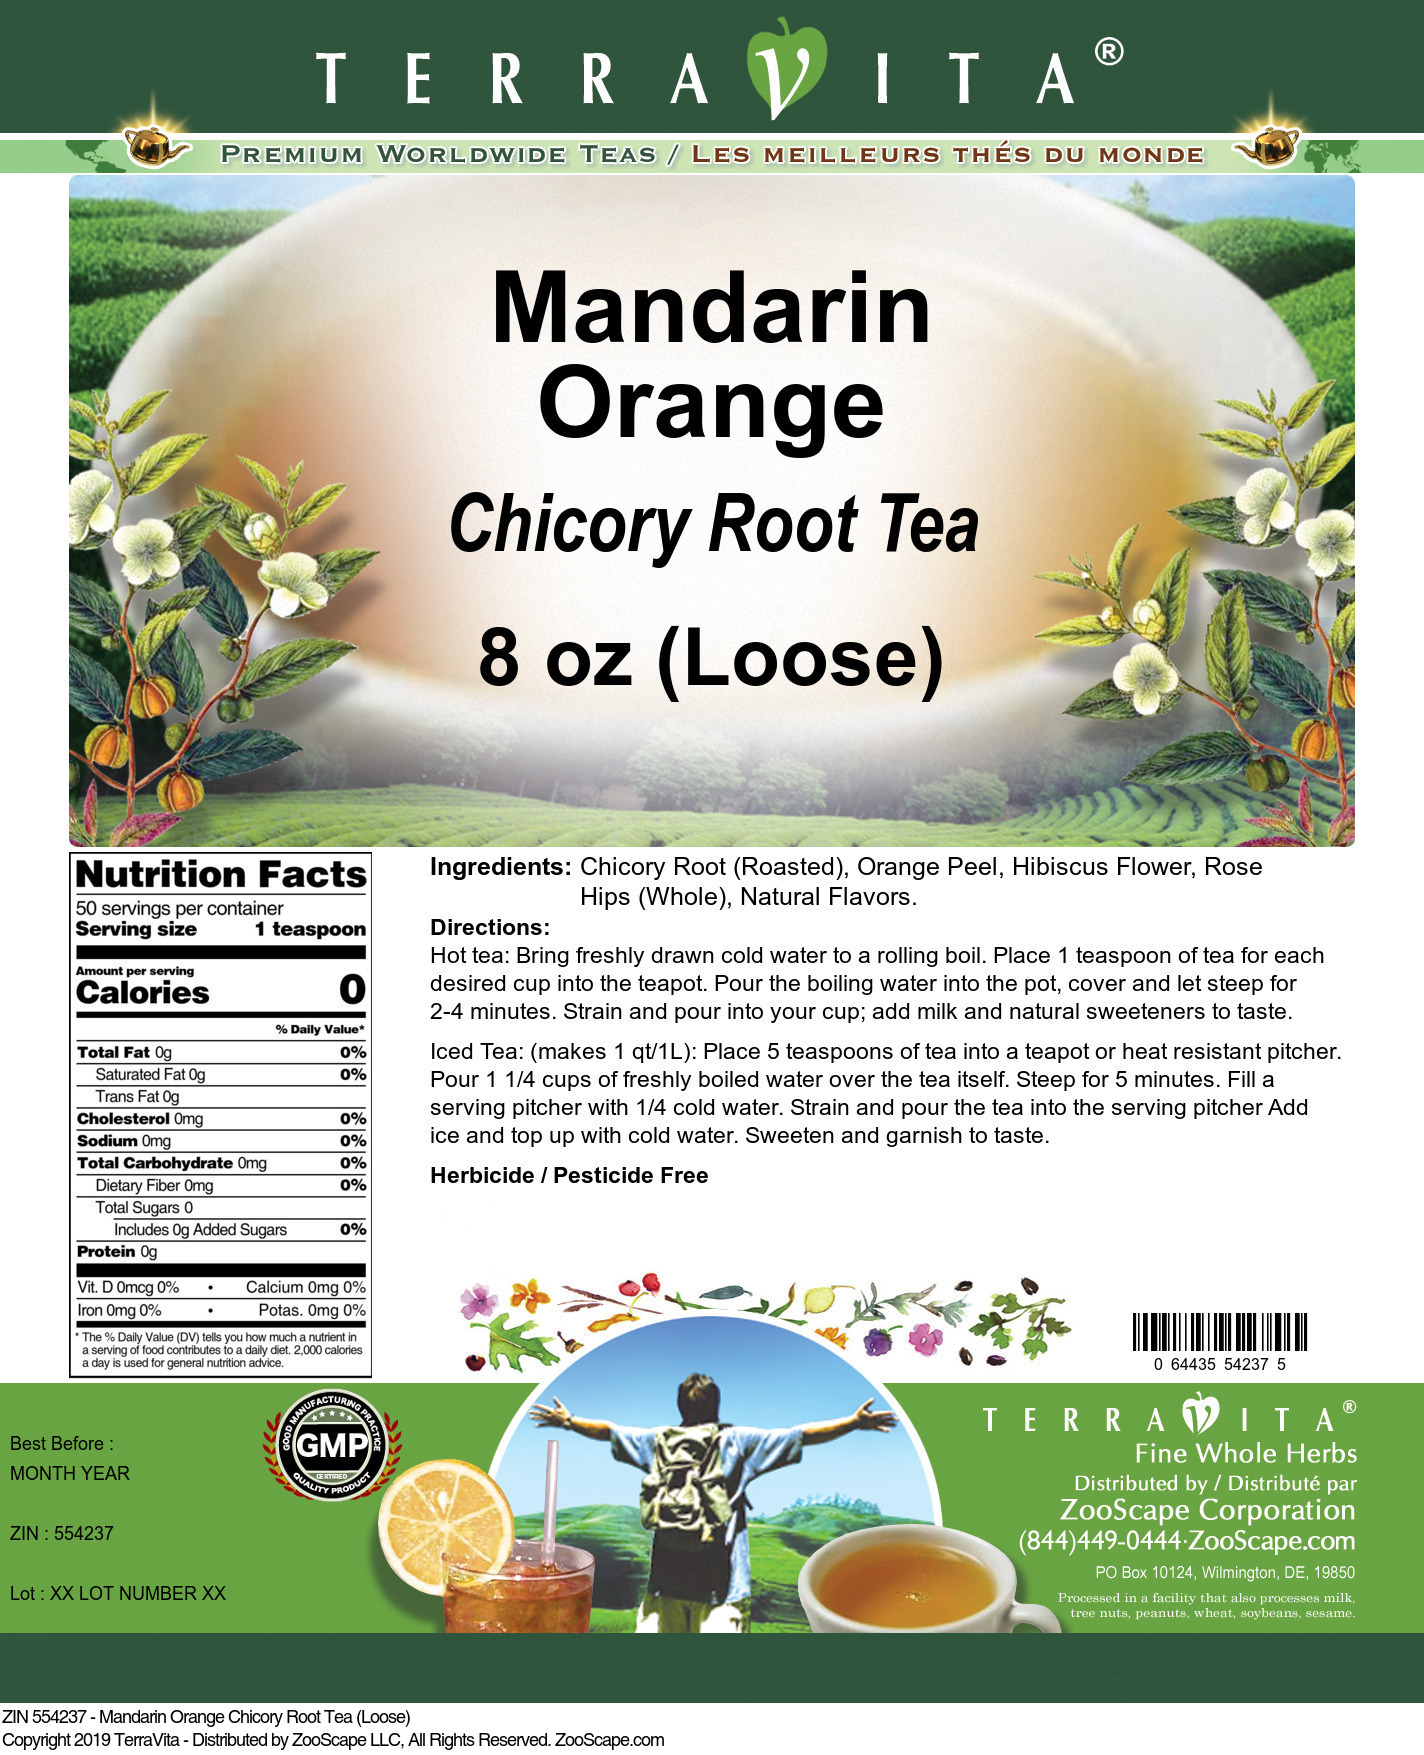 Mandarin Orange Chicory Root Tea (Loose)